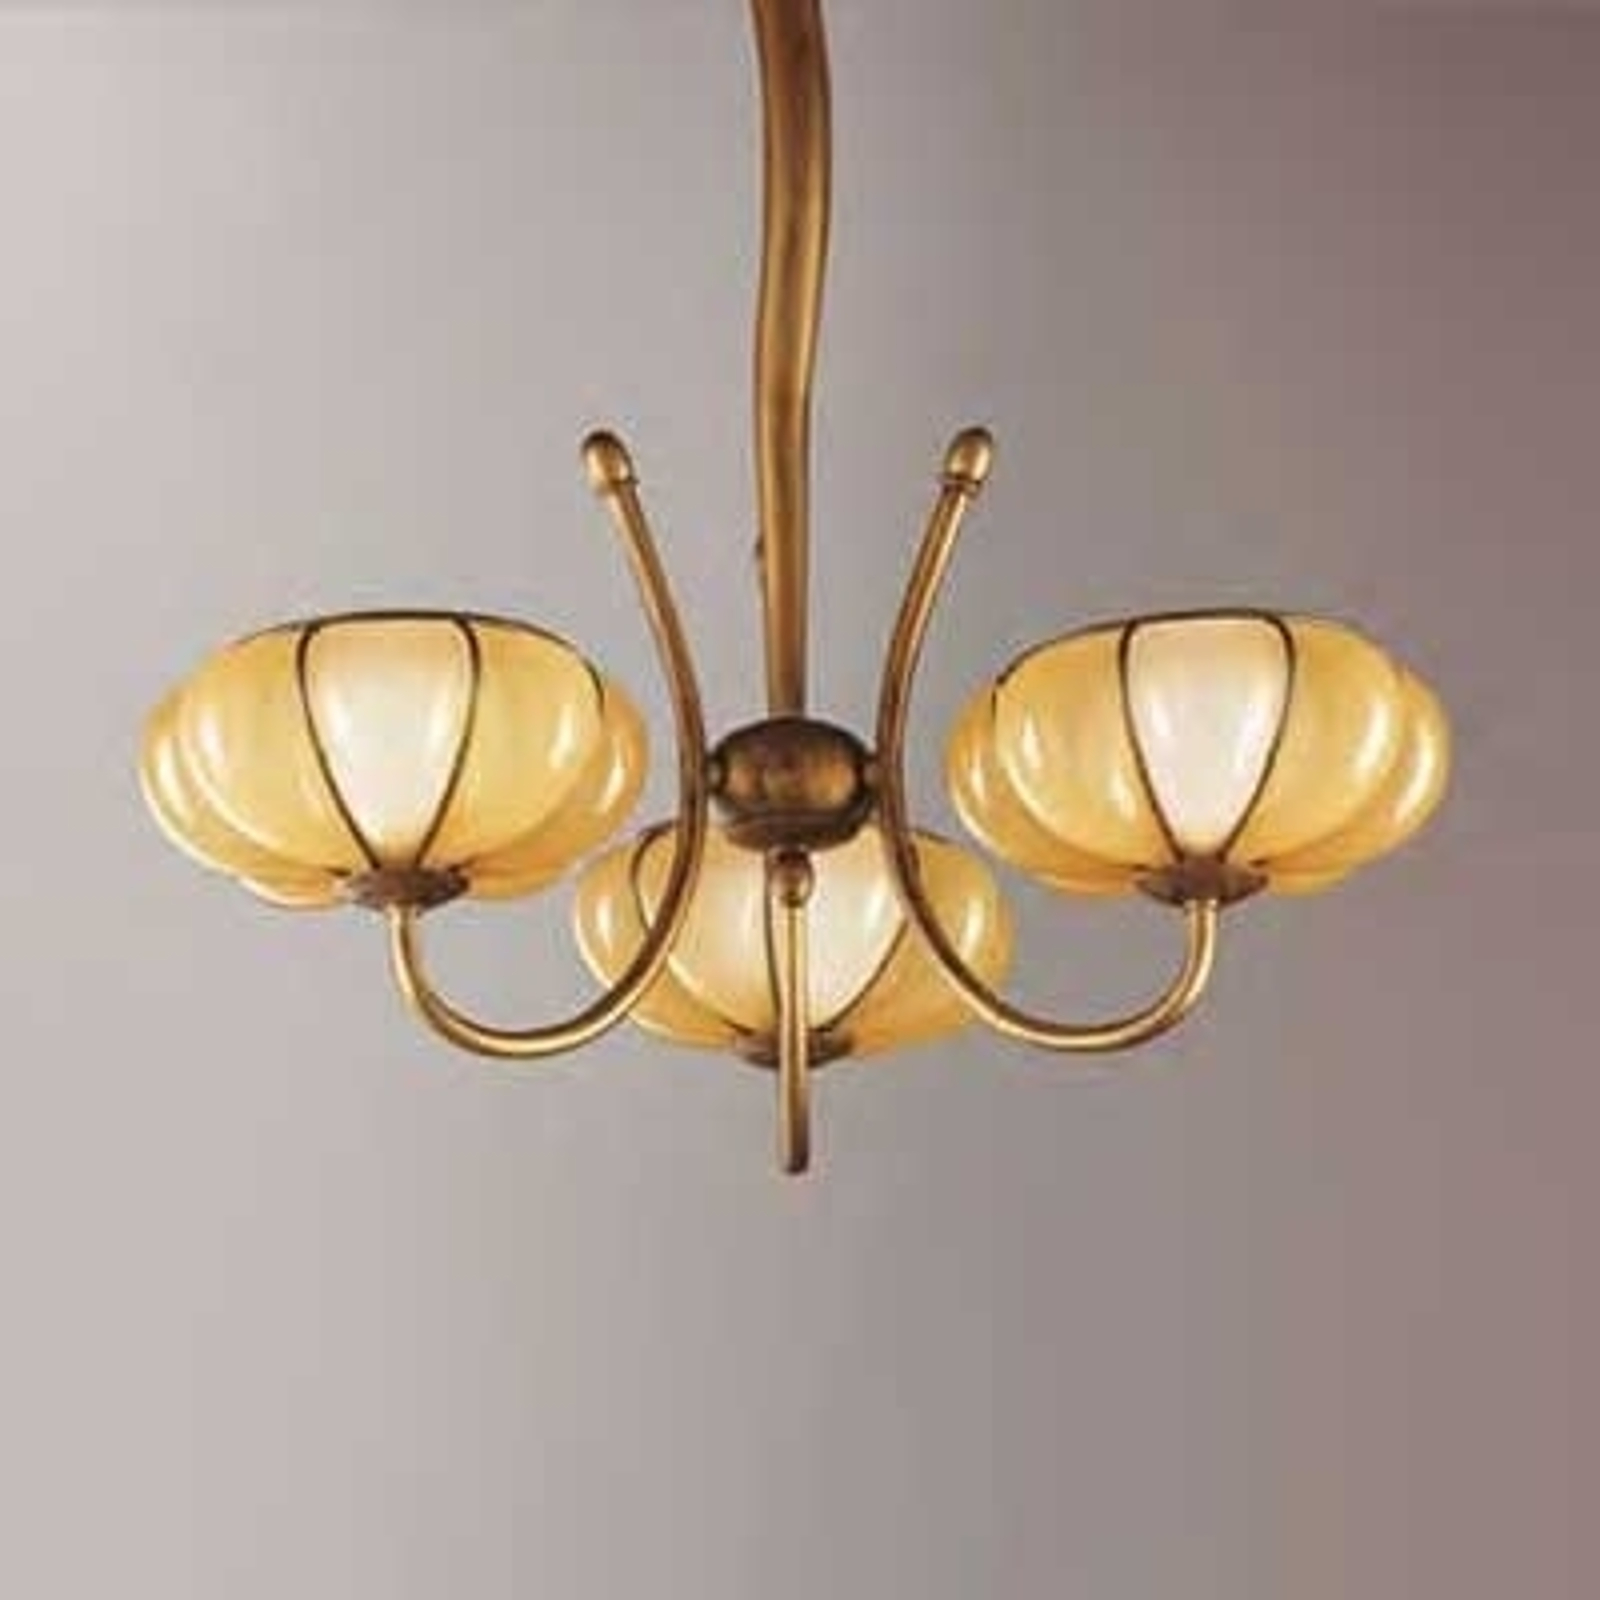 LOTO klasyczna lampa sufitowa